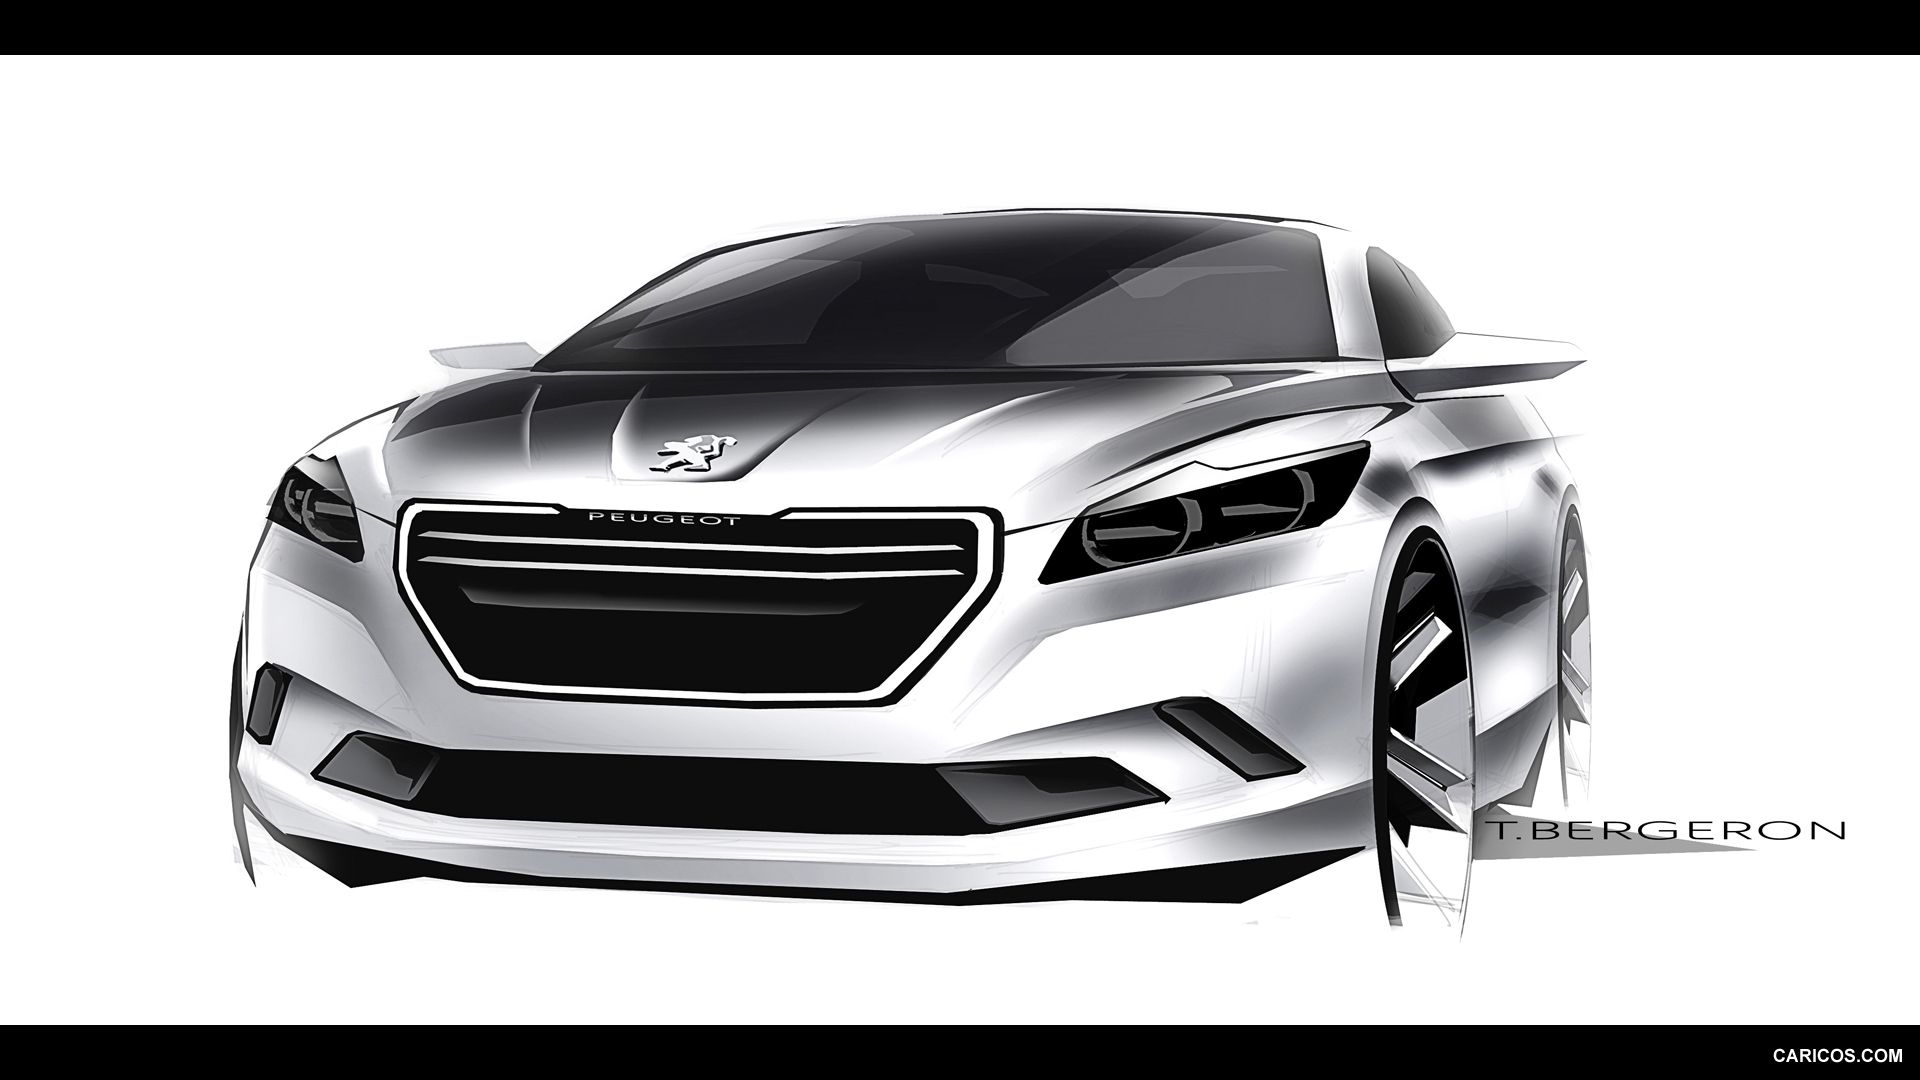 2013 Peugeot 301 Wallpaper Sketches Pinterest